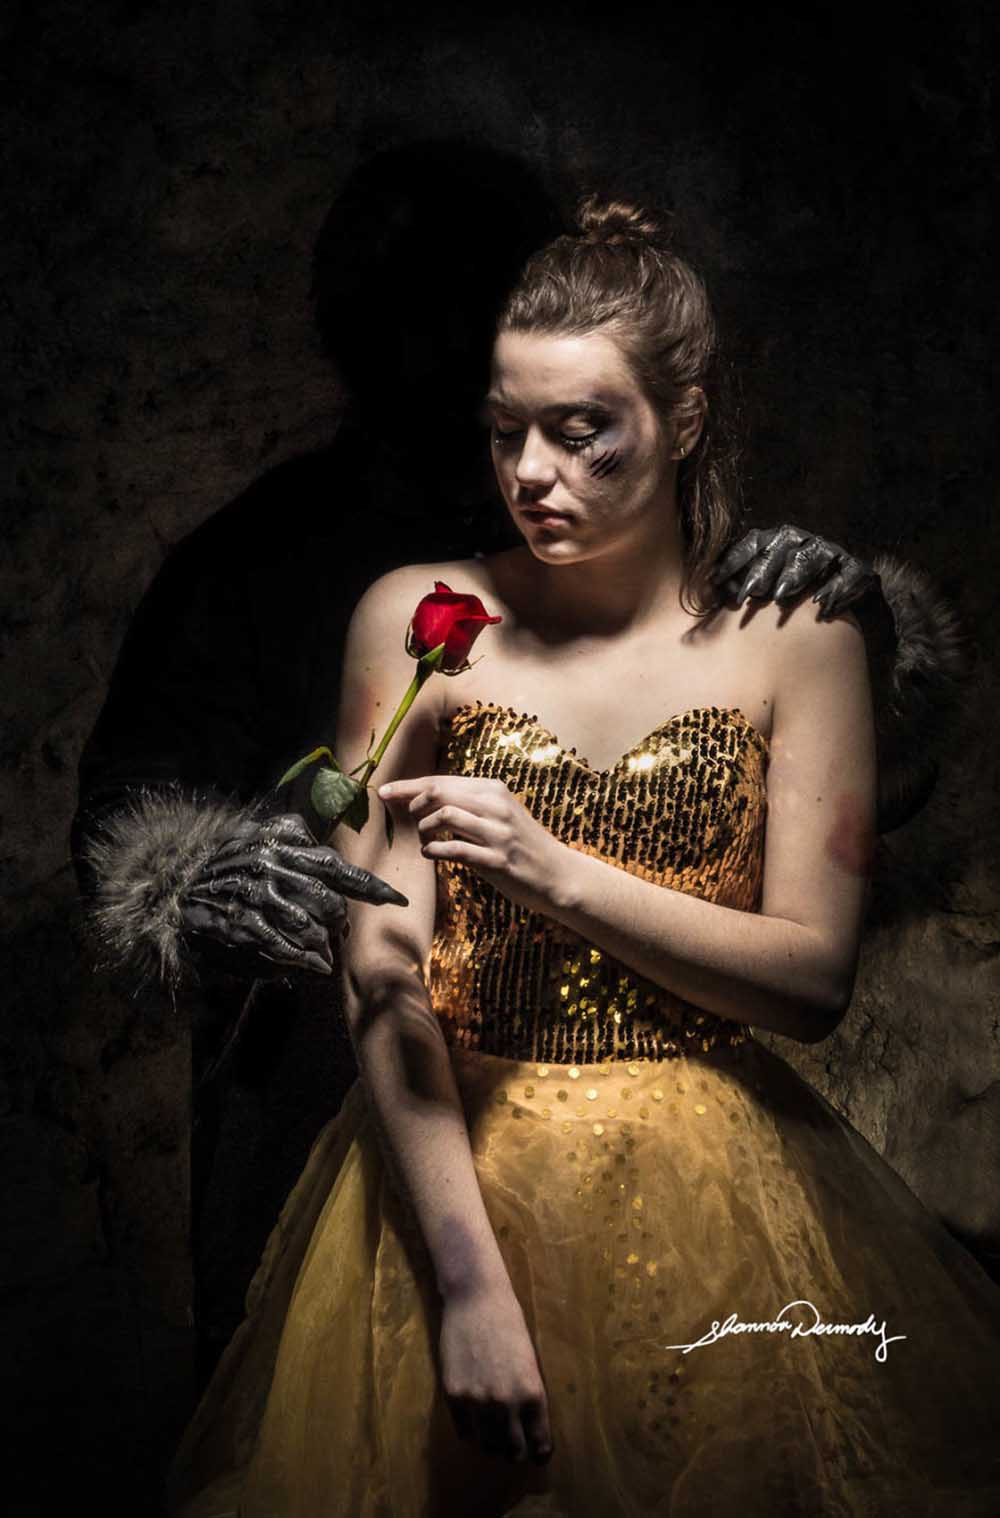 disney-princesses-real-world-problems-shannon-dermody-5-590c895edc3e3-880-5415832762e1f8b5f3e7d383fbaae9b4.jpg